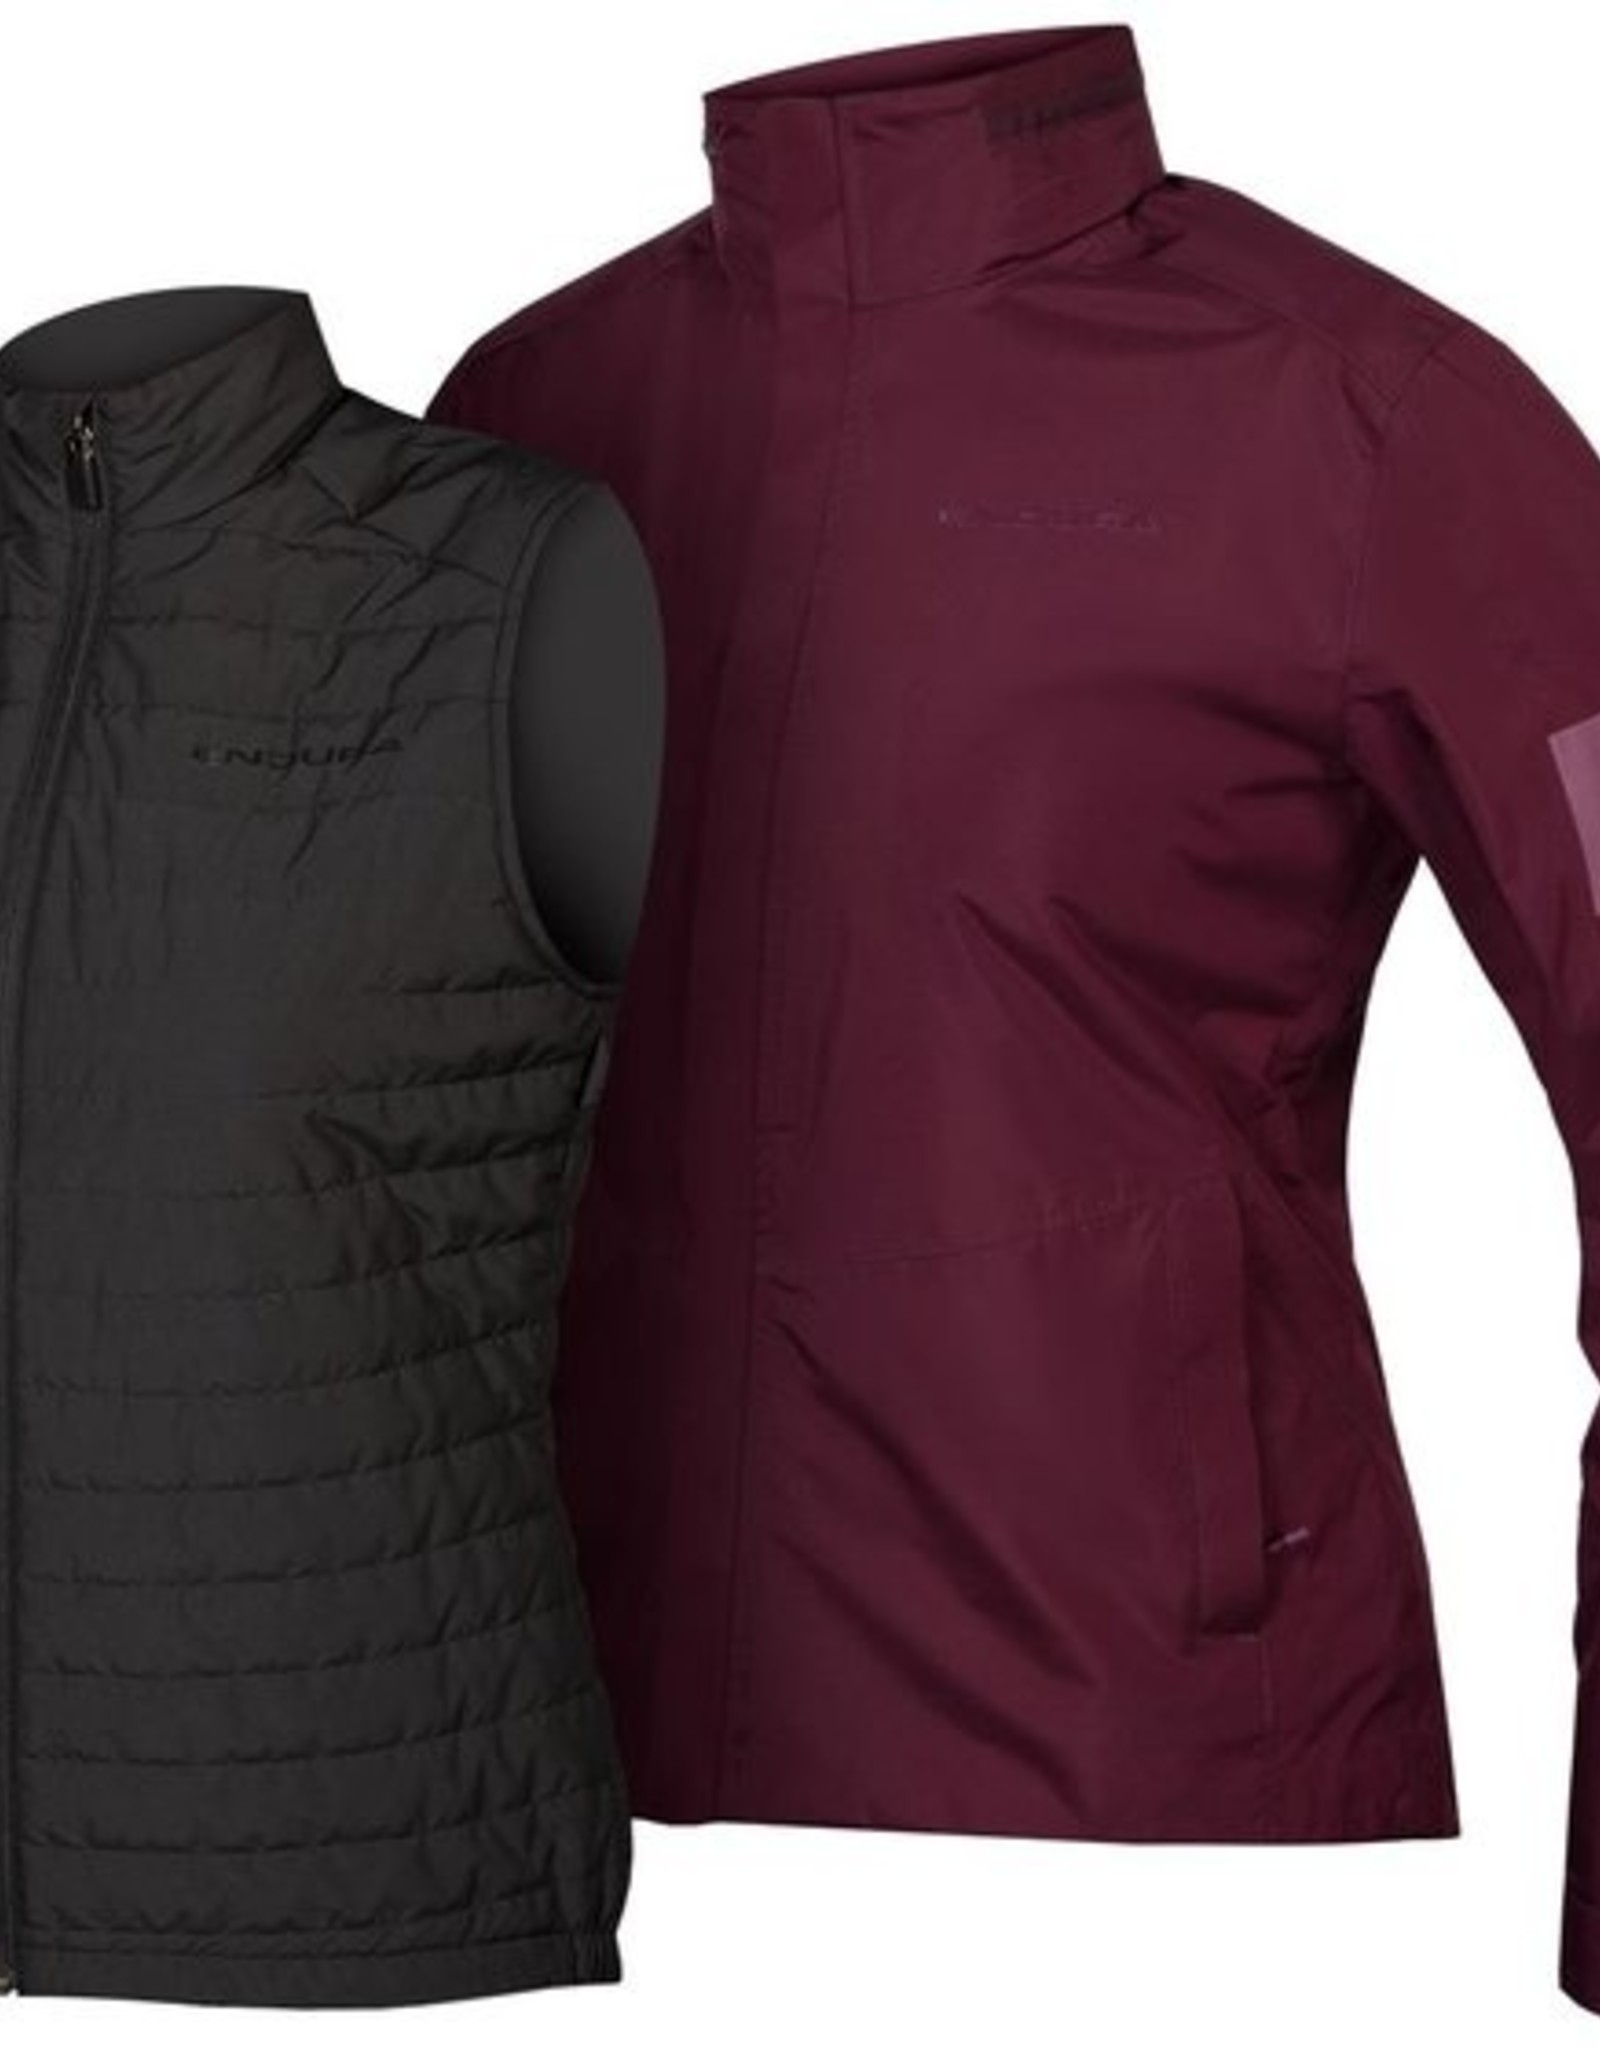 ENDURA Endura Urban 3 in 1 Waterproof Jacket Women's Berry